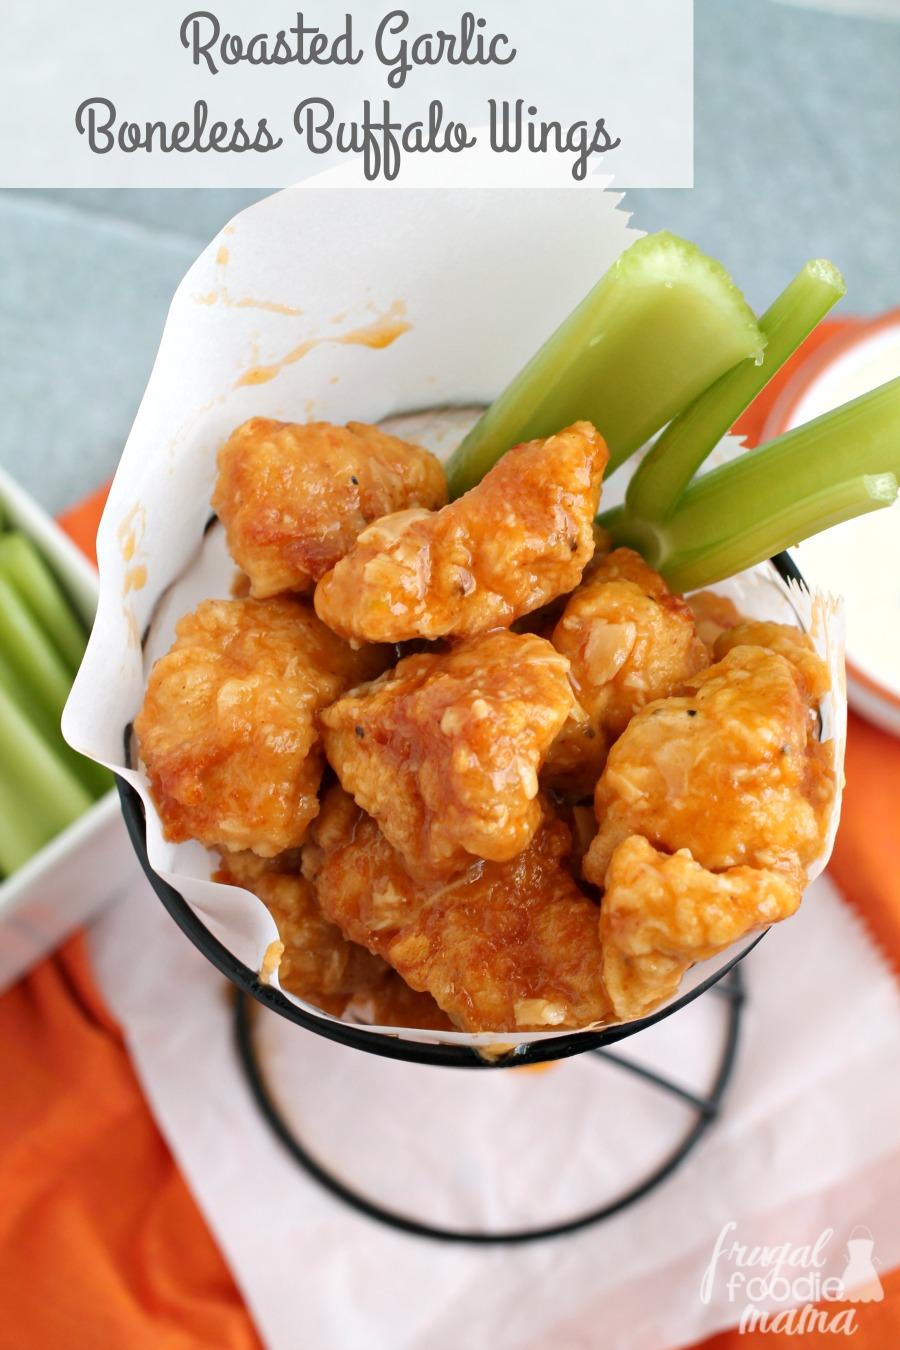 Frugal Foodie Mama Roasted Garlic Boneless Buffalo Wings